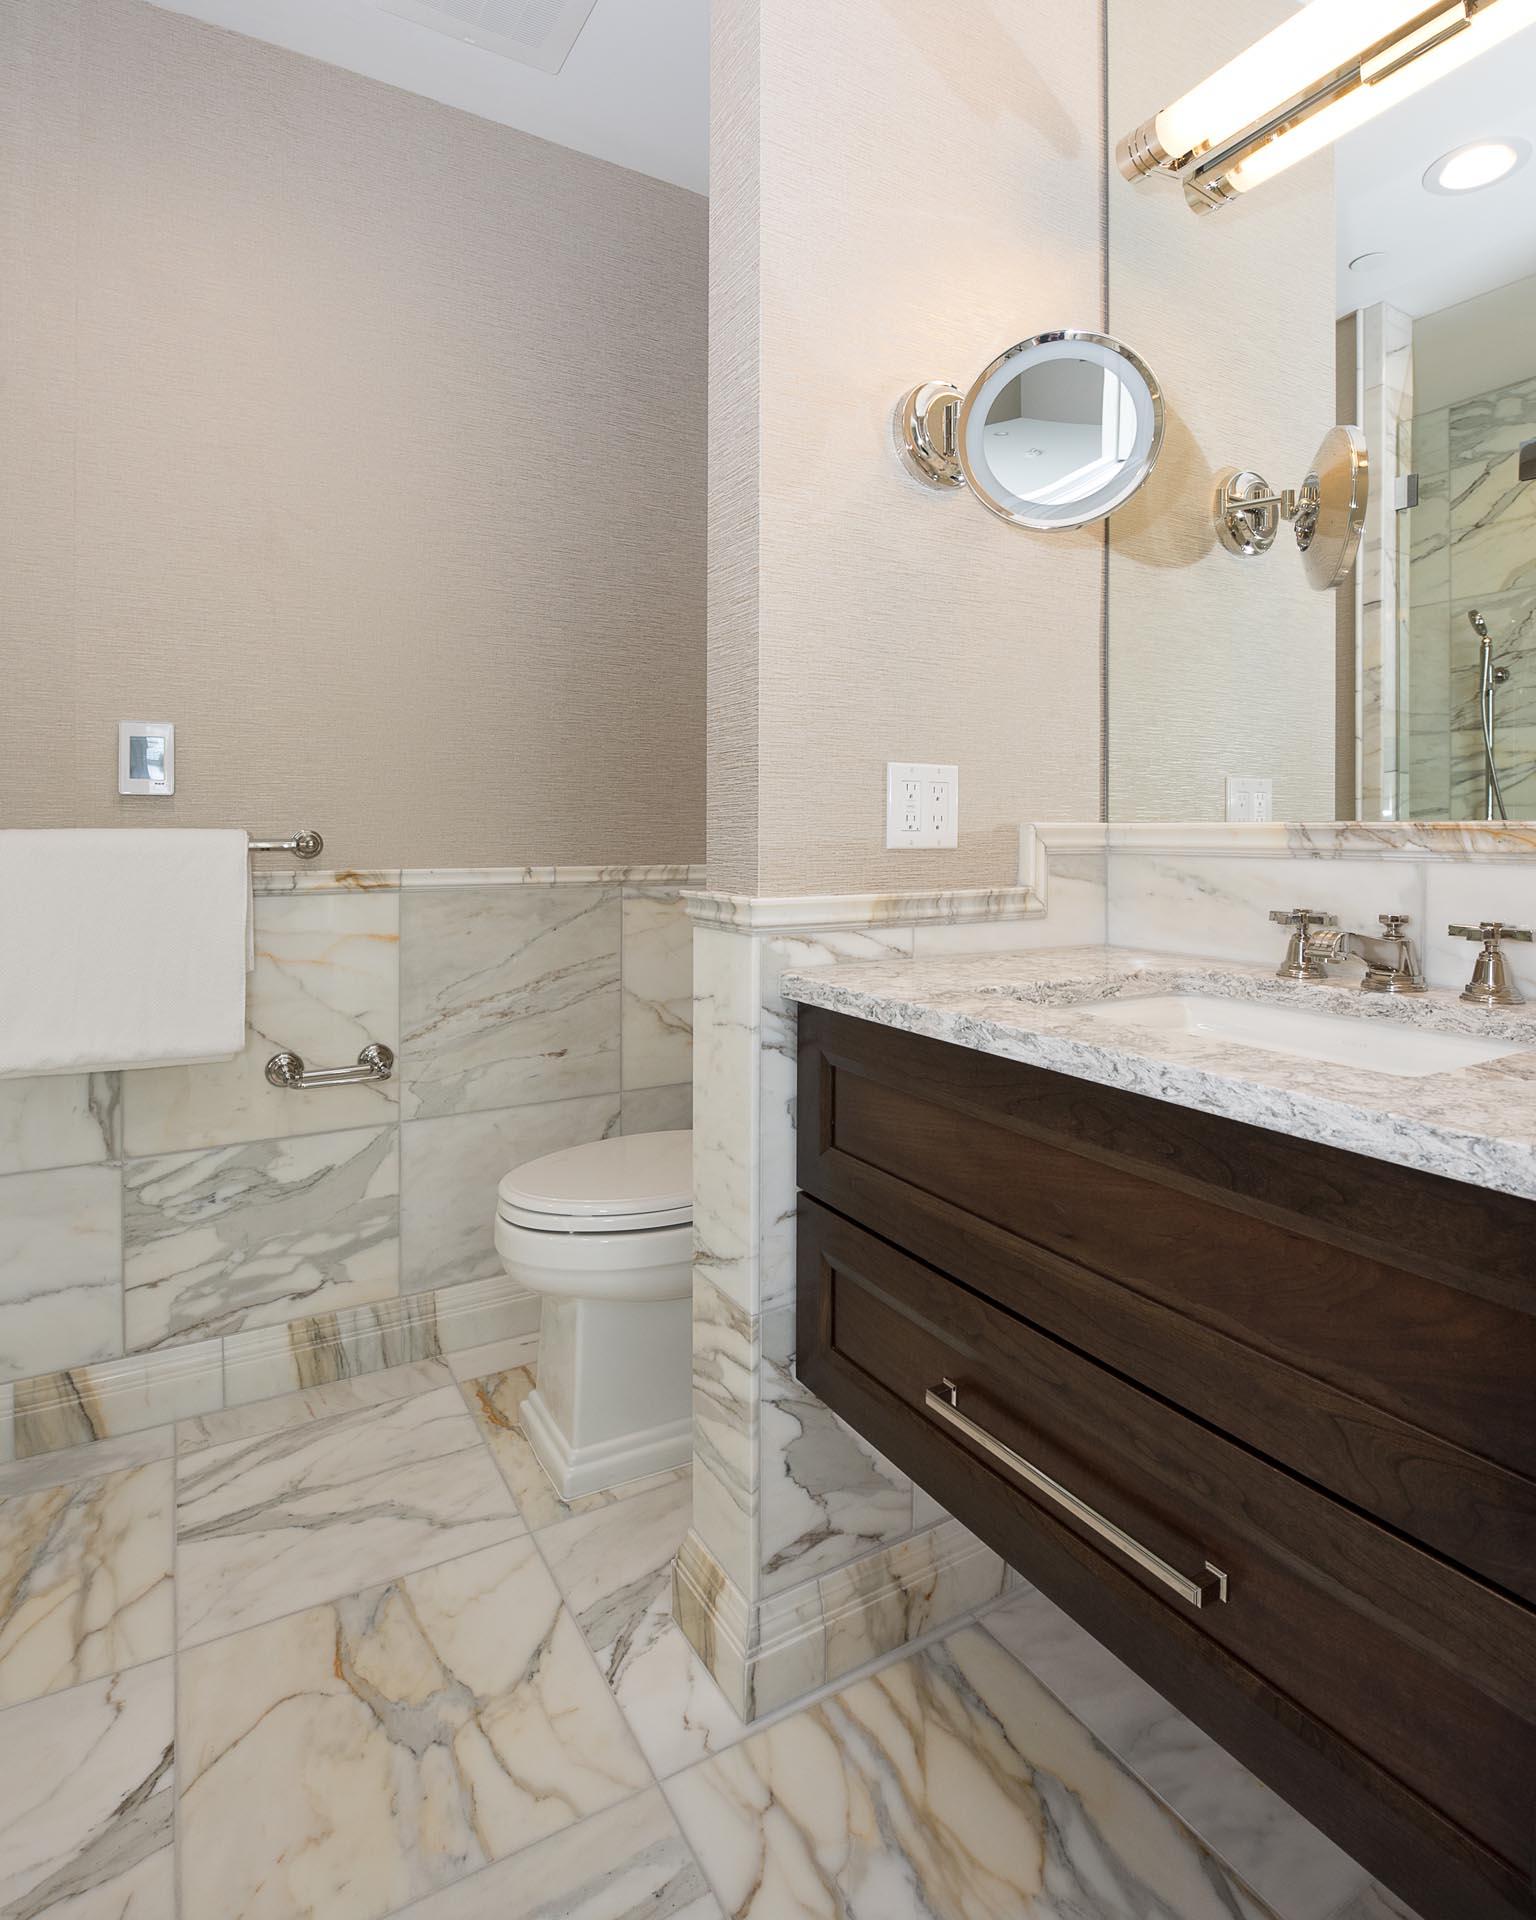 Bathroom Sink and Toilet | H Residence | Midland, MI